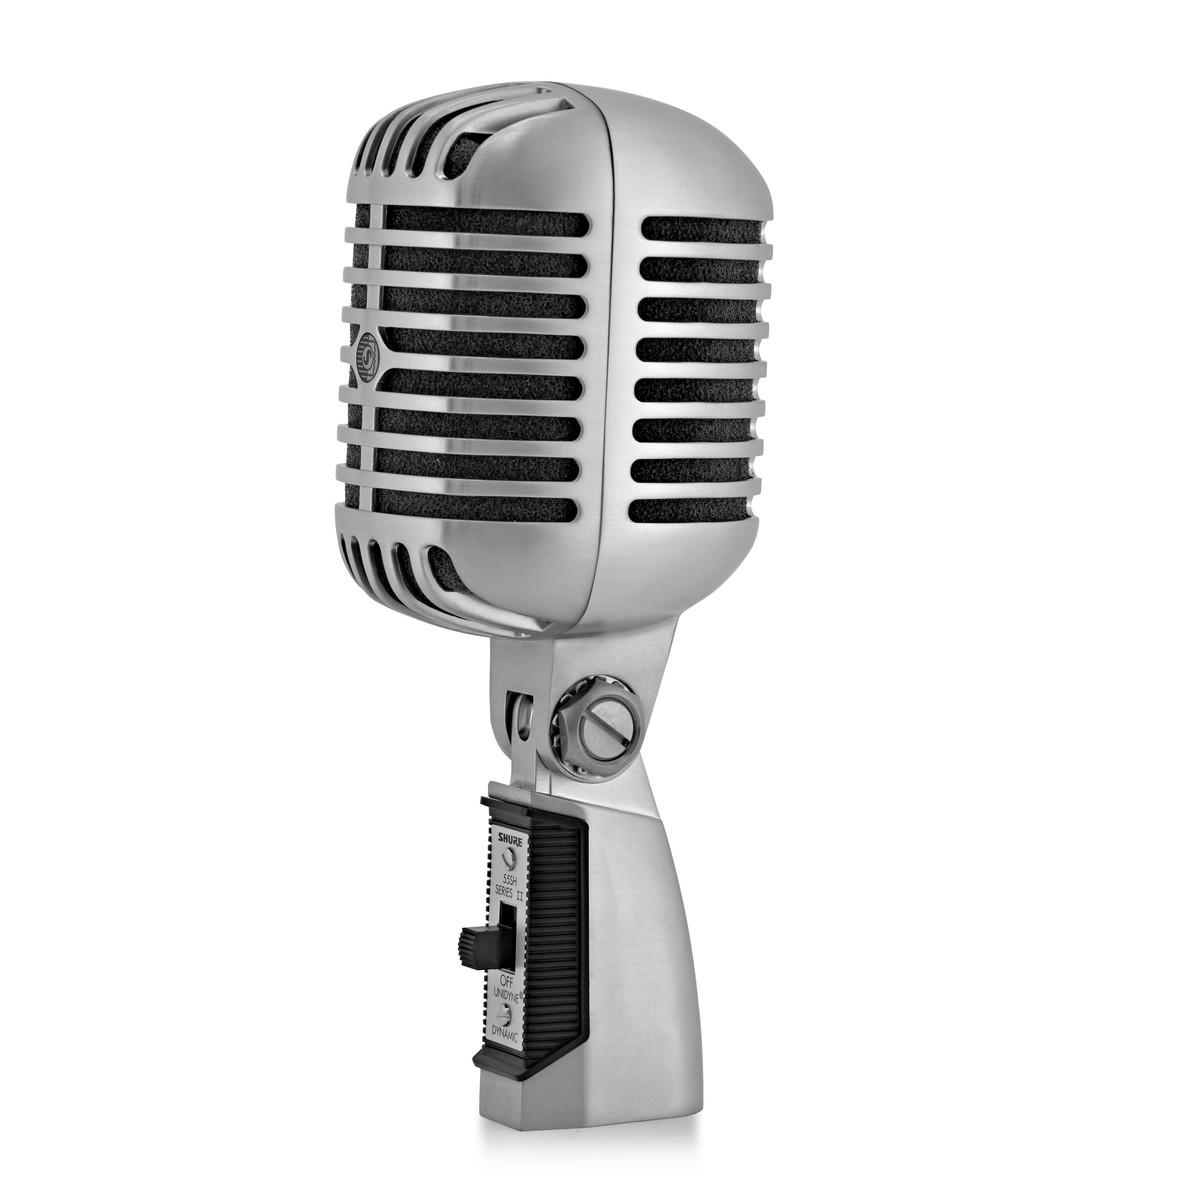 Shure Super 55 Deluxe vokalmikrofon | Gear4music